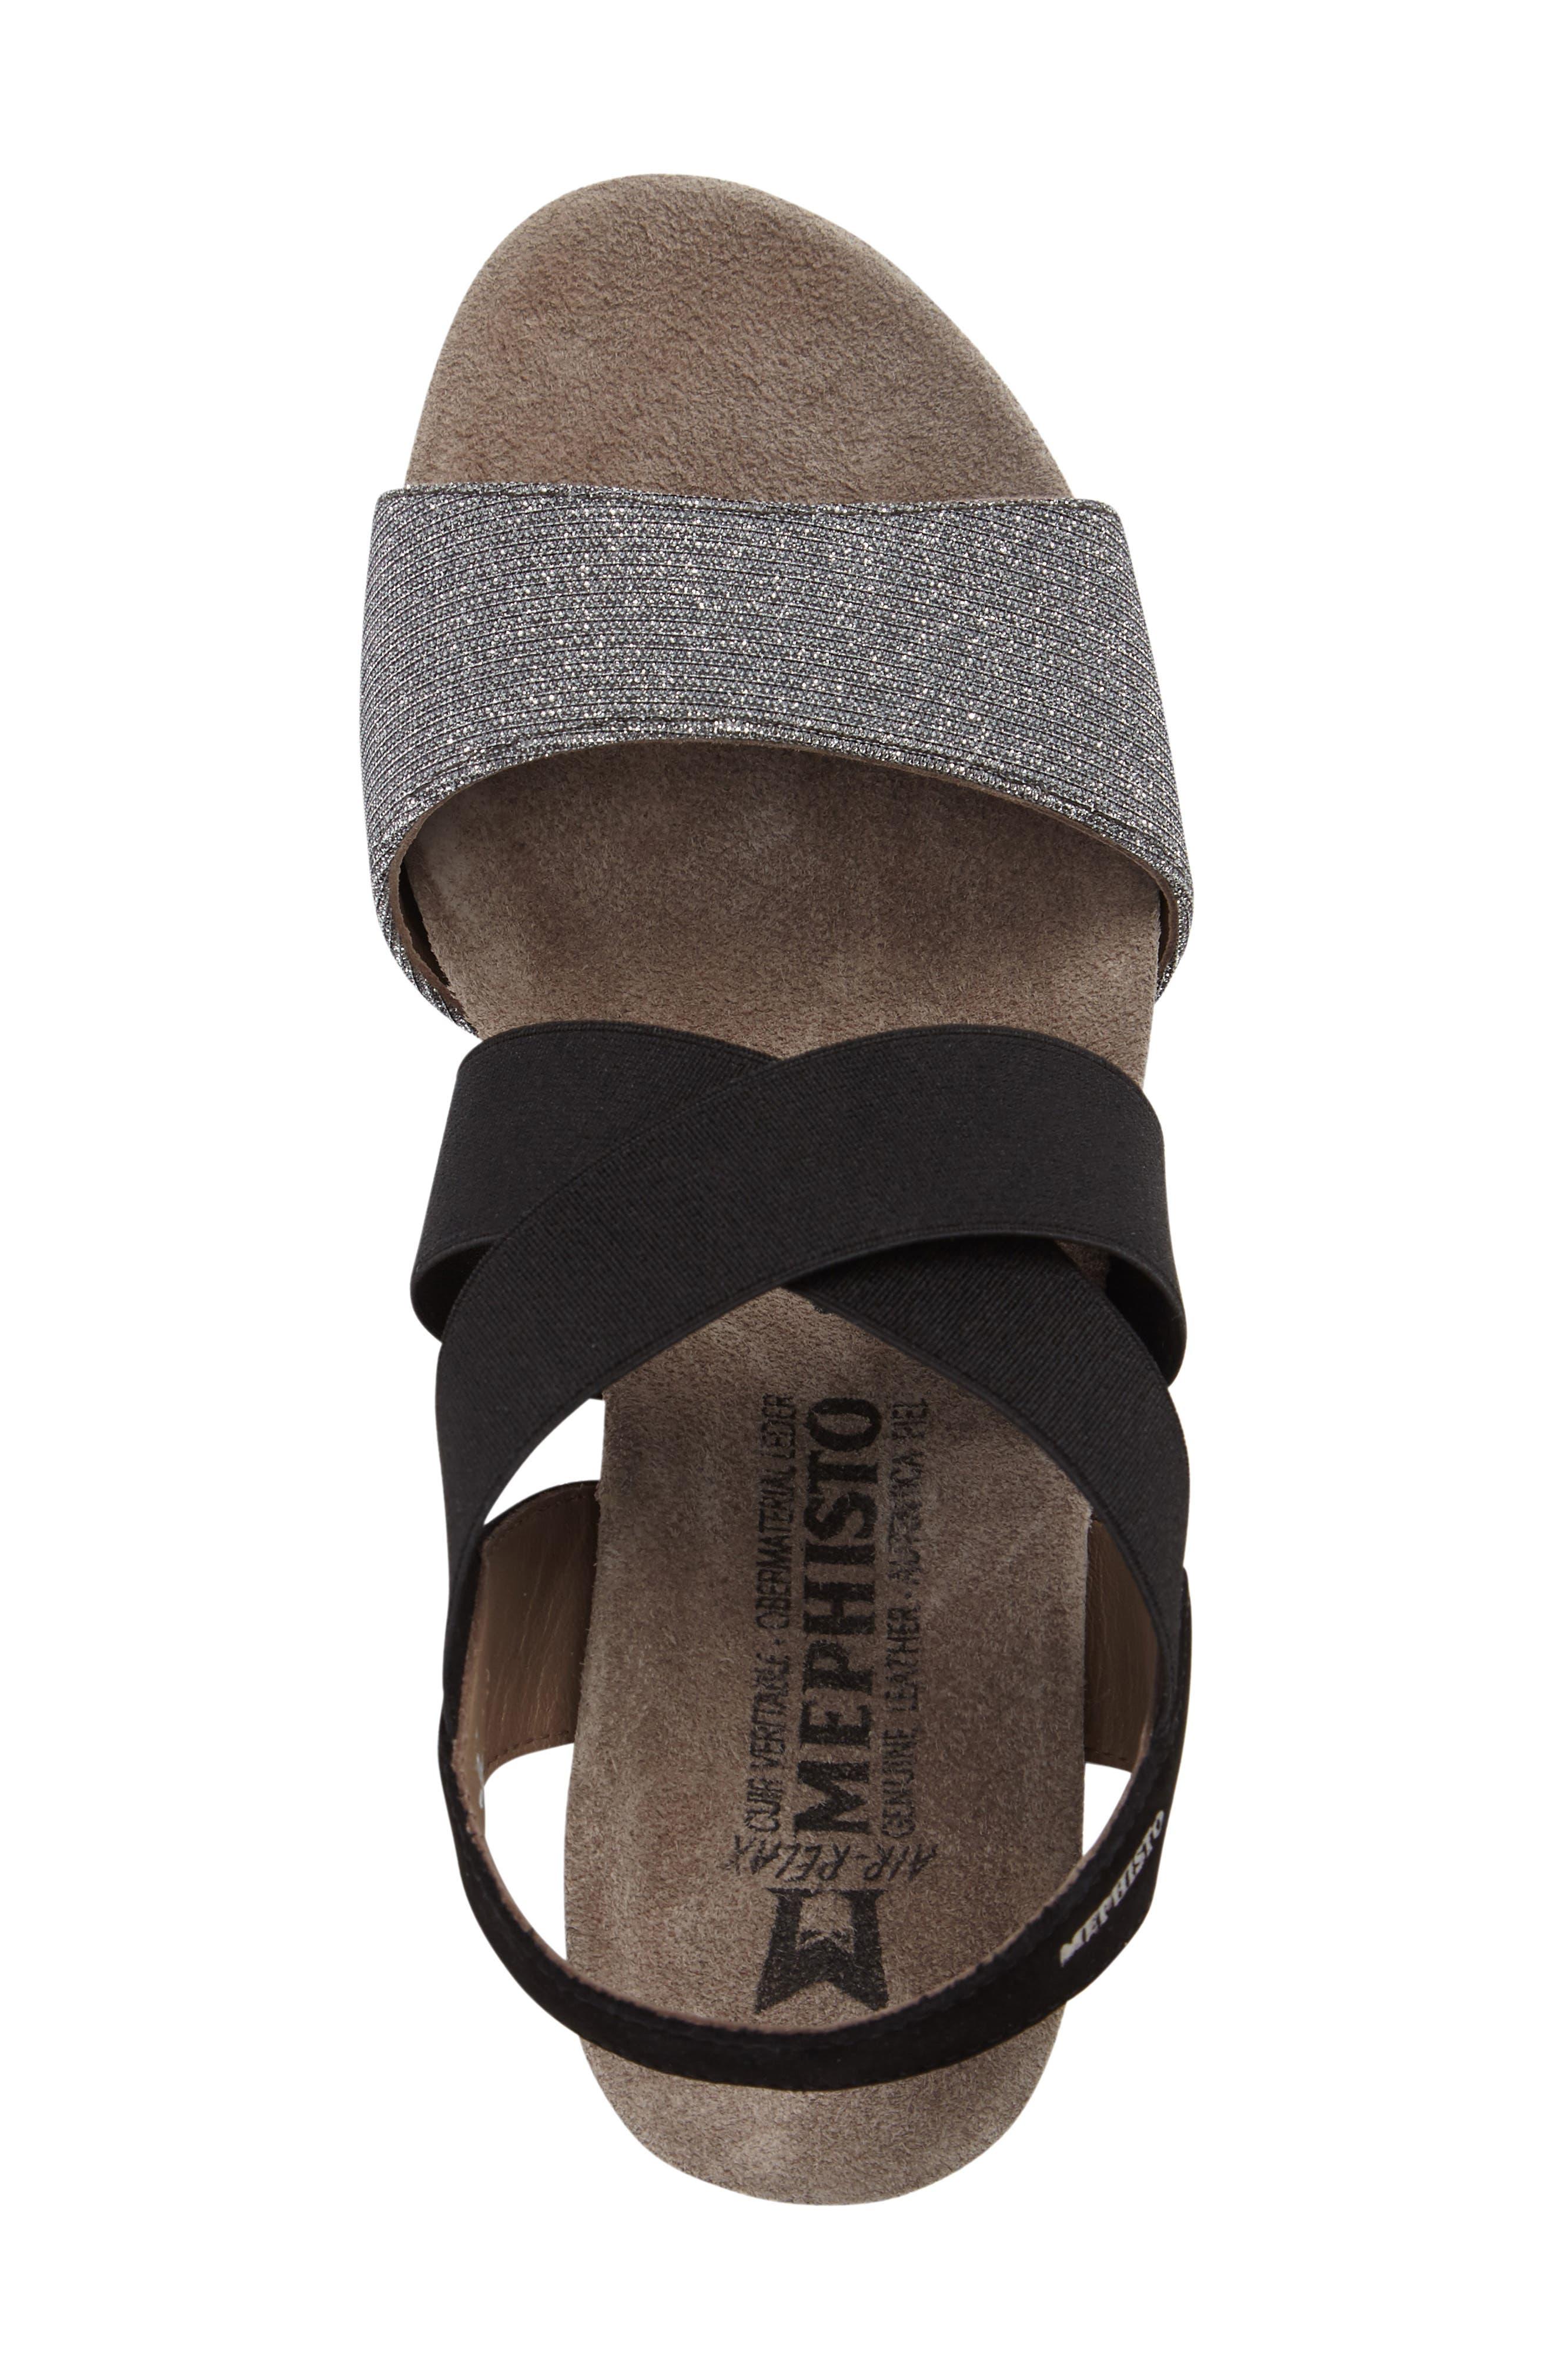 'Barbara' Wedge Sandal,                             Alternate thumbnail 5, color,                             BLACK BUCKSOFT LEATHER